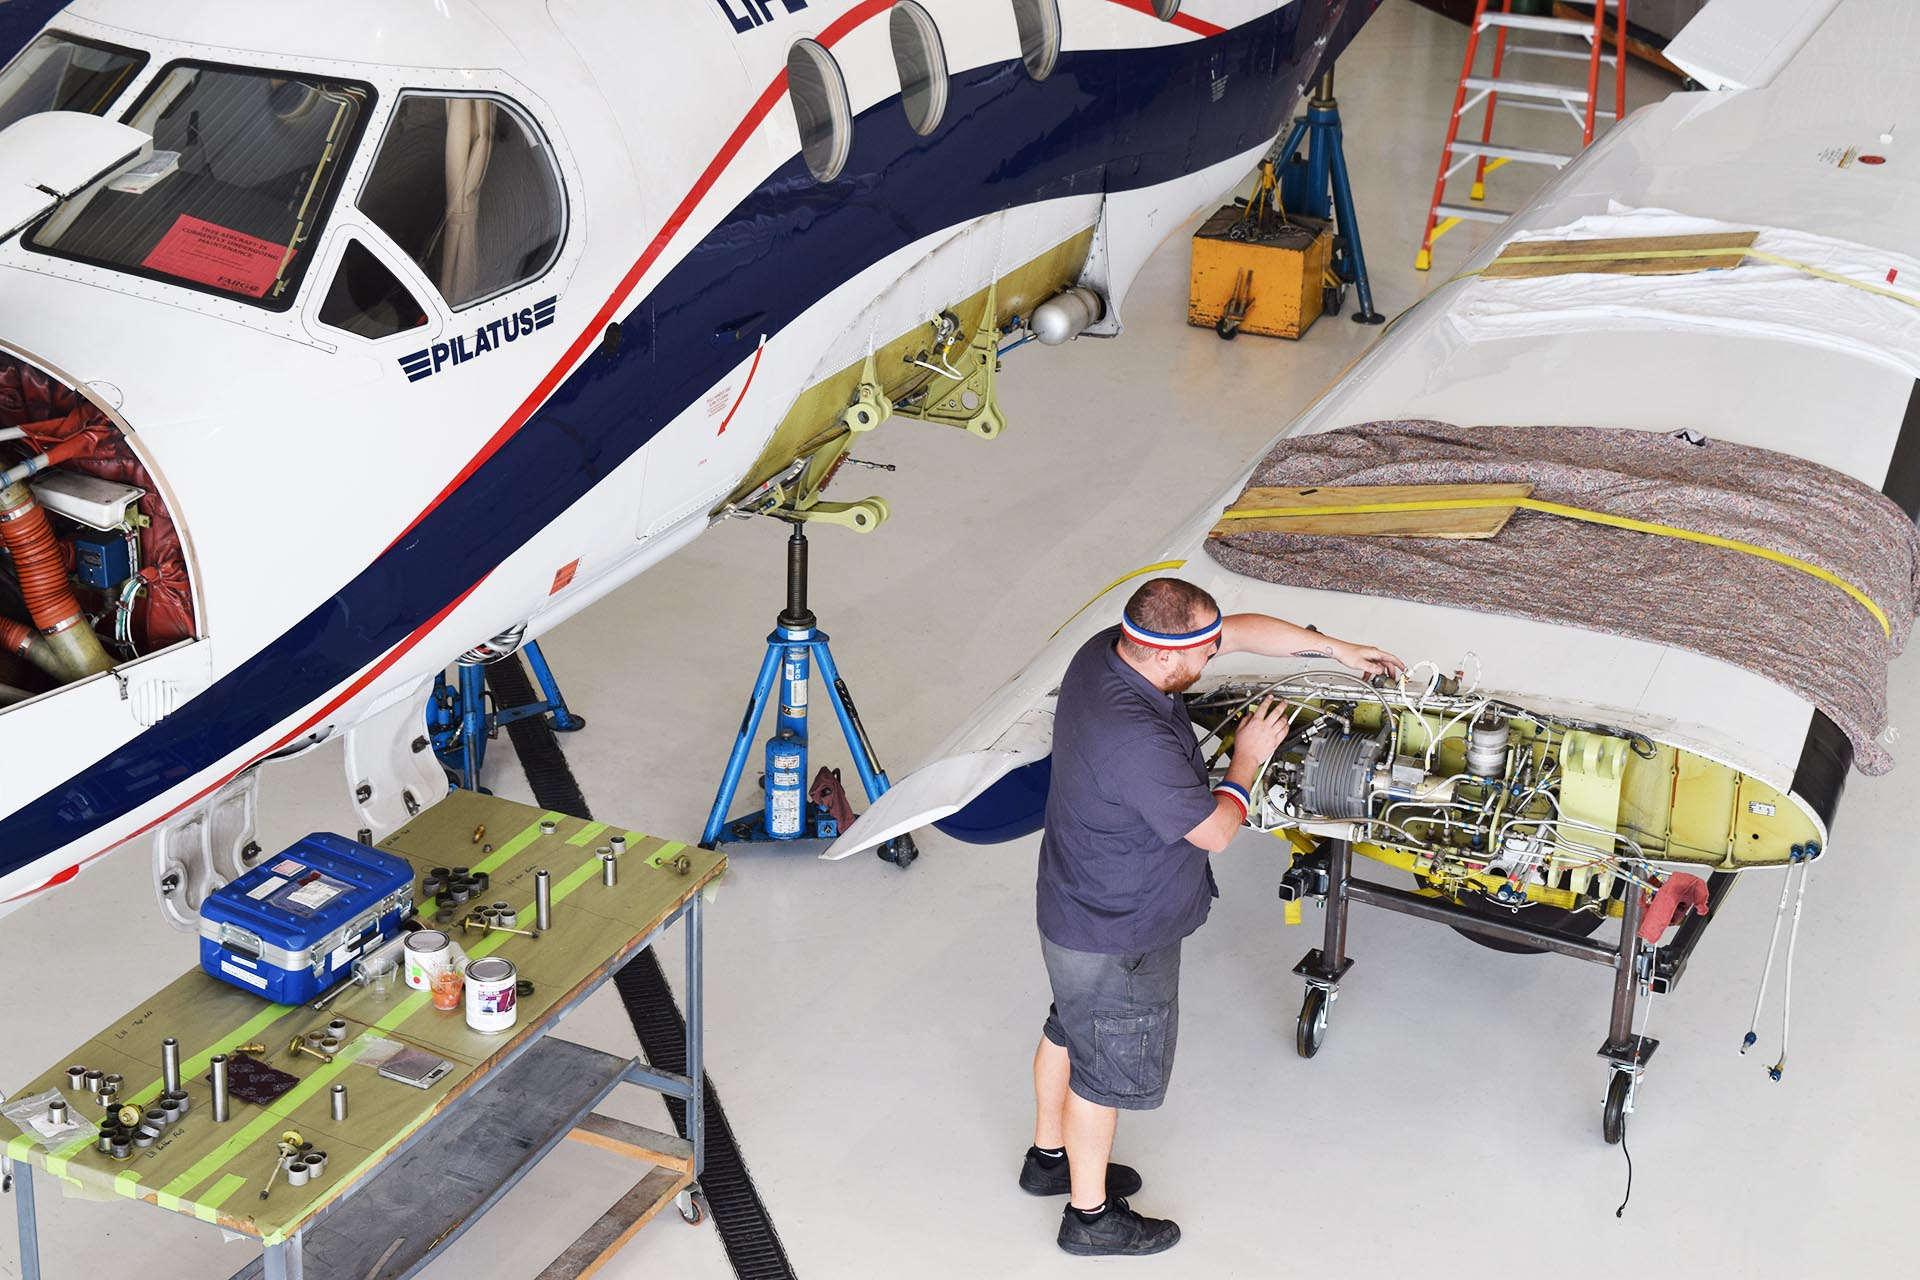 fargo jet center pc-12 pilatus service wing inspection